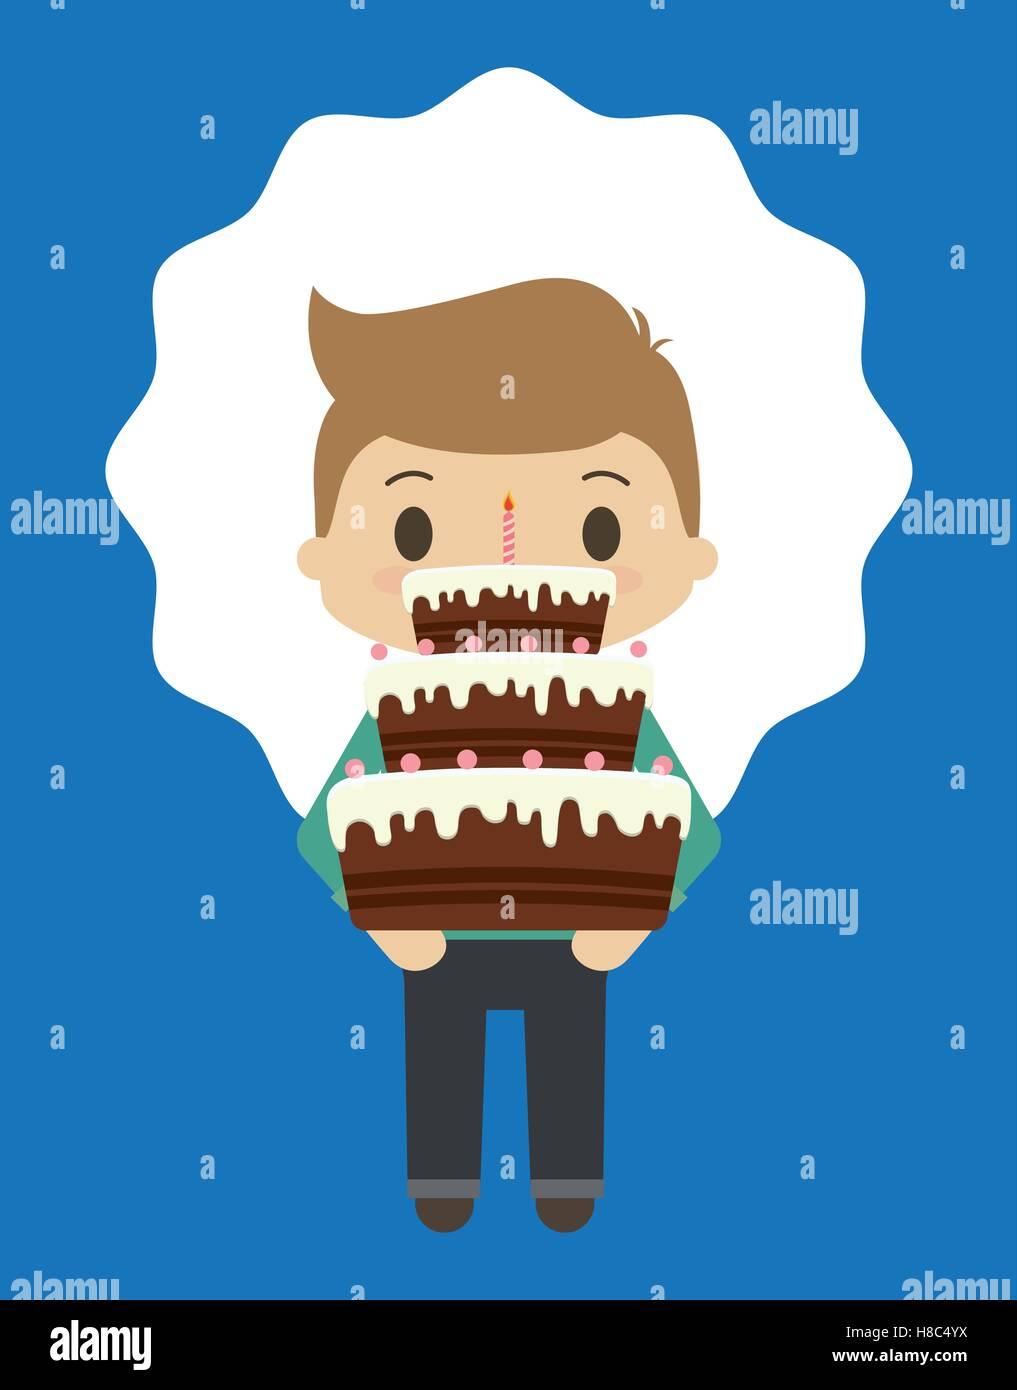 Alles Gute zum Geburtstag Kind cartoon Stockbild